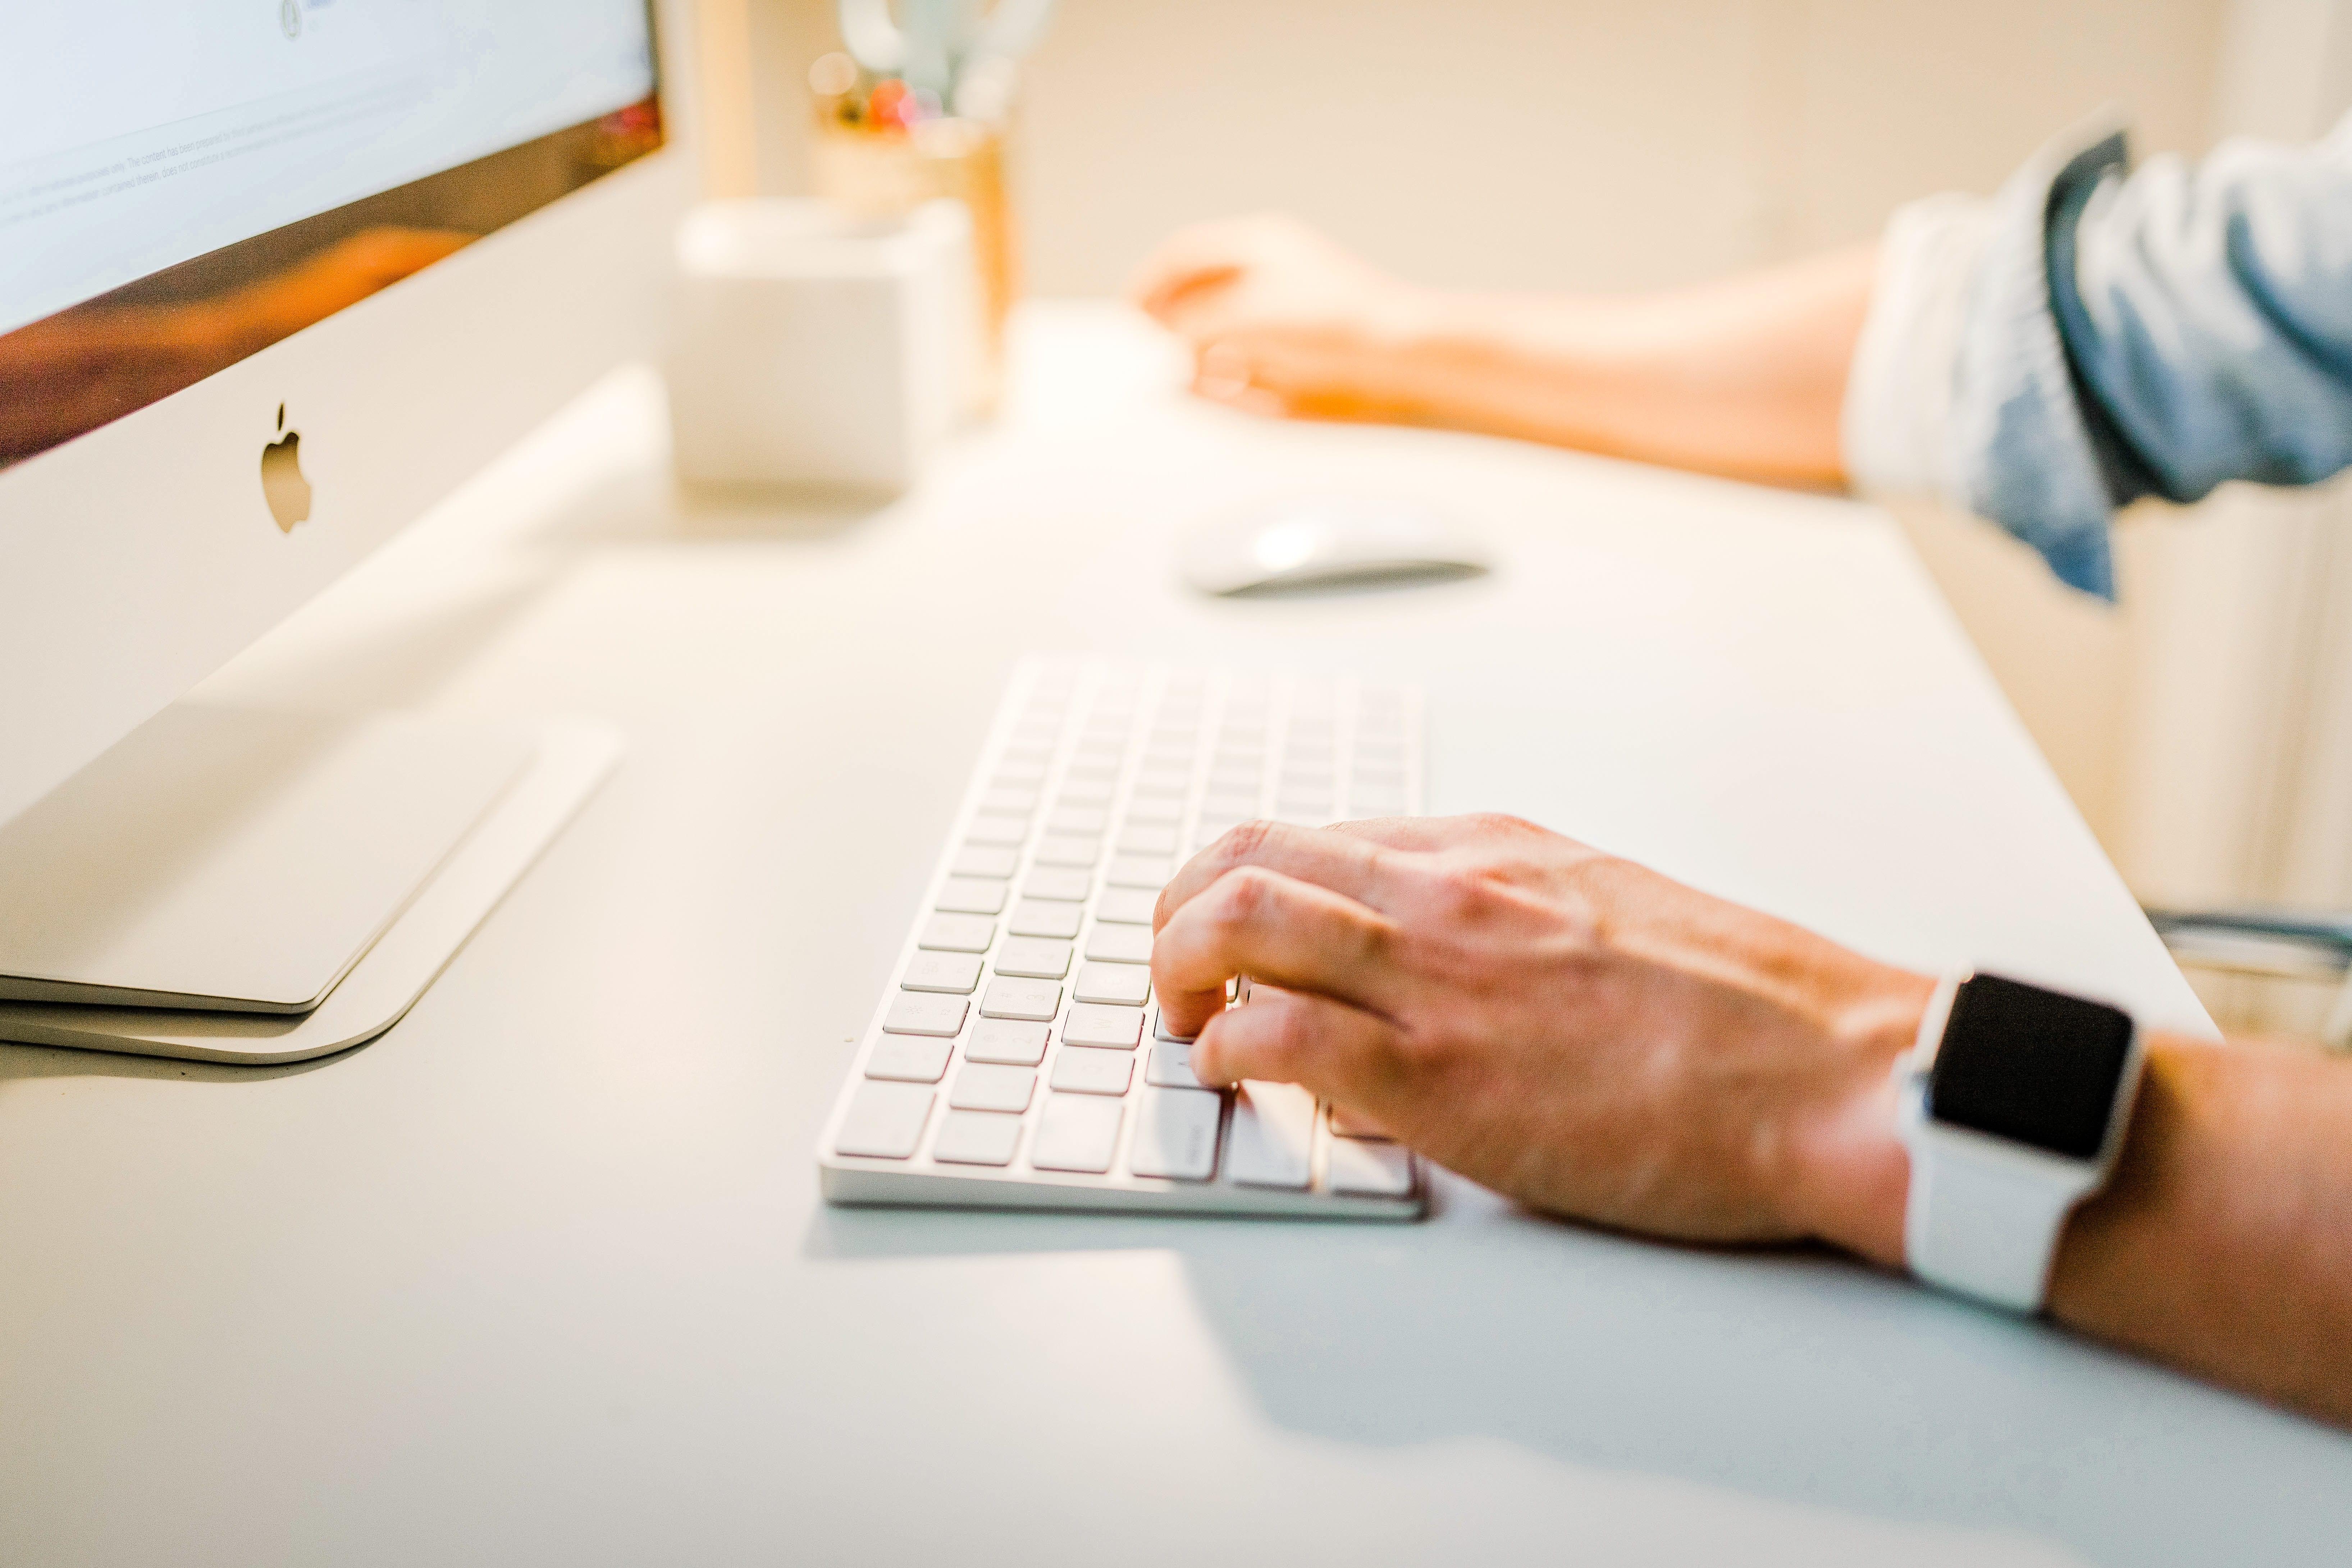 Man working at computer; image by Austin Distel, via Unsplash.com.